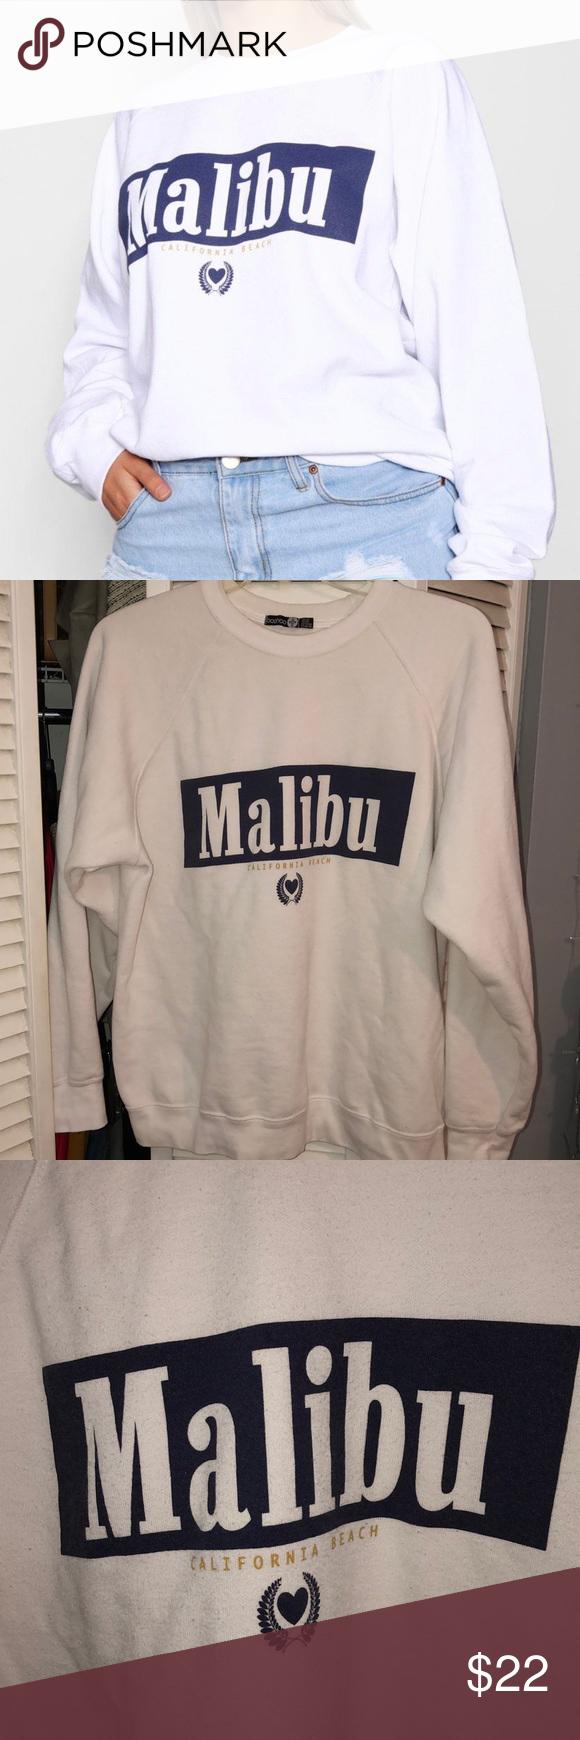 Boohoo Plus Size Malibu Crewneck Sweatshirt Crew Neck Sweatshirt Sweatshirts Clothes Design [ 1740 x 580 Pixel ]